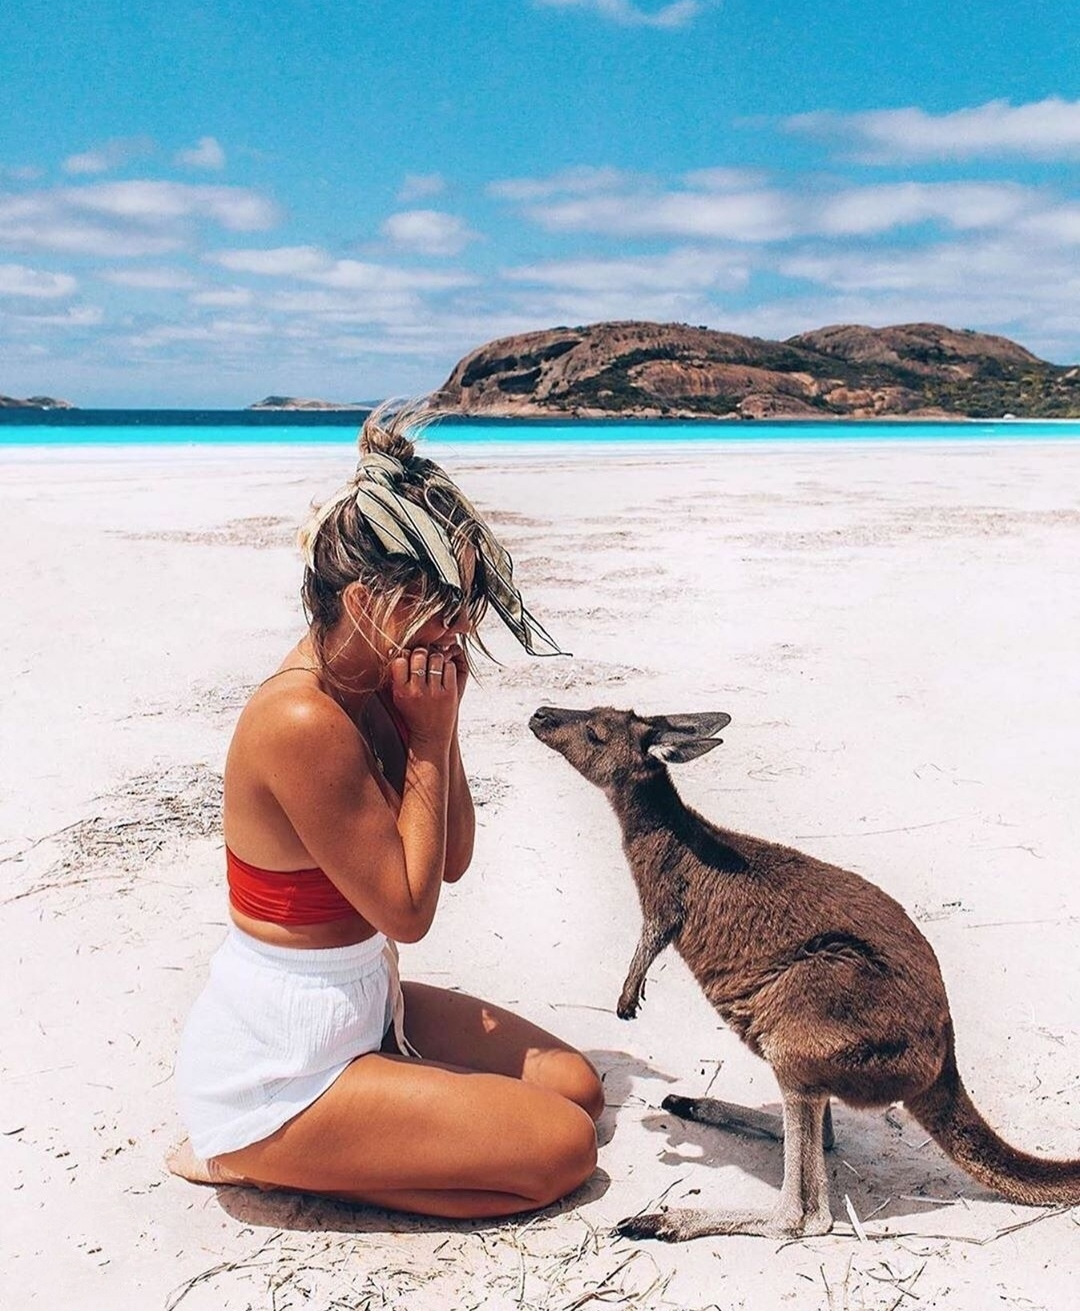 Top 10 Amazing Photos of Australia [2020]  - Australia HD Images Free